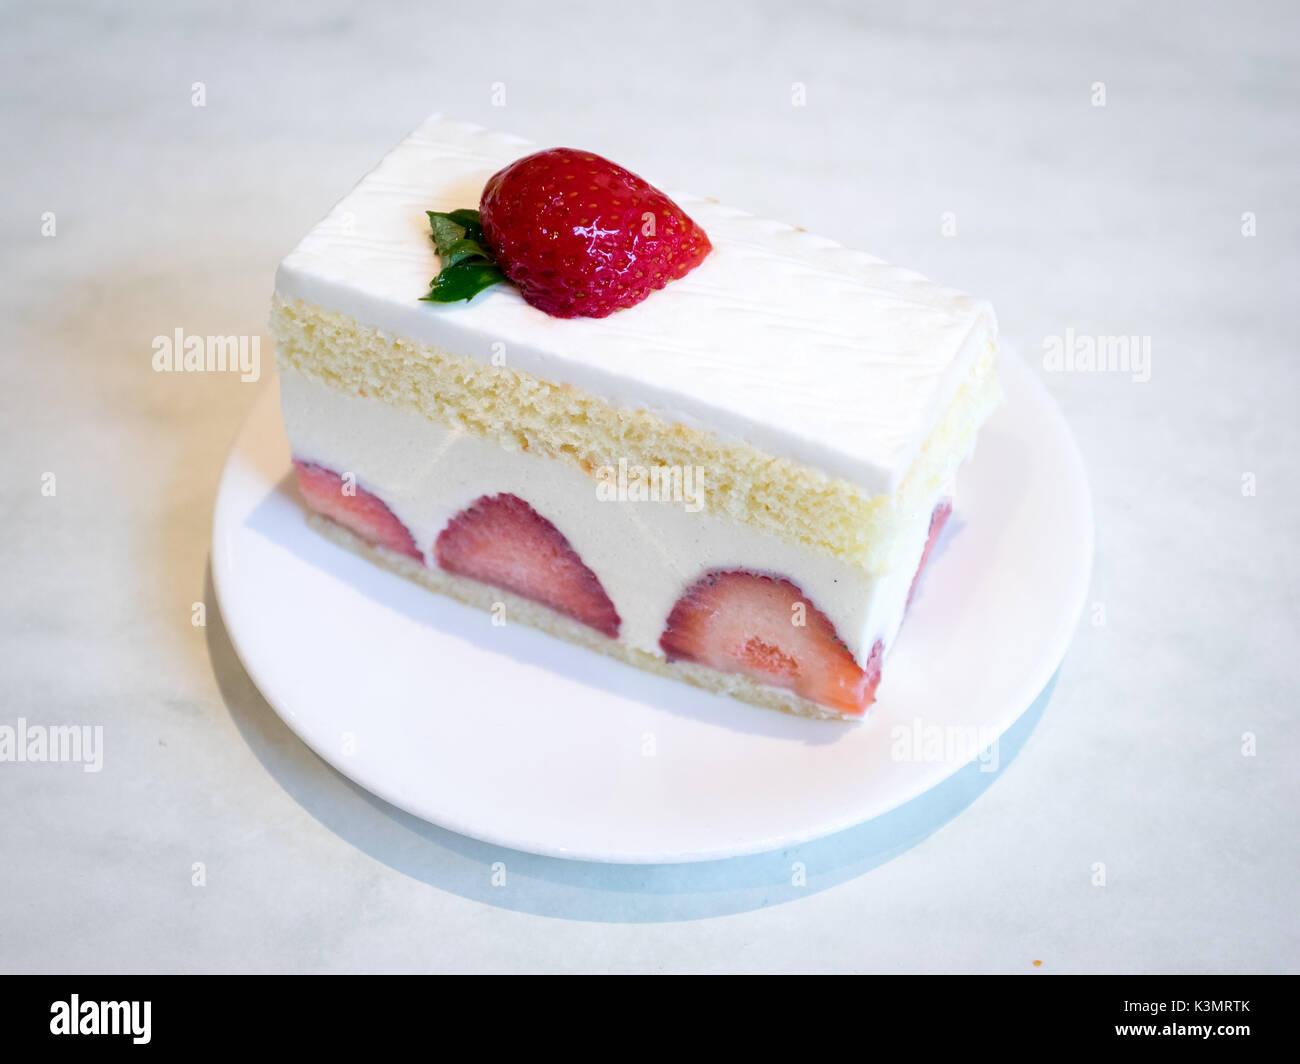 A slice of delicious strawberry shortcake, a popular dessert. - Stock Image